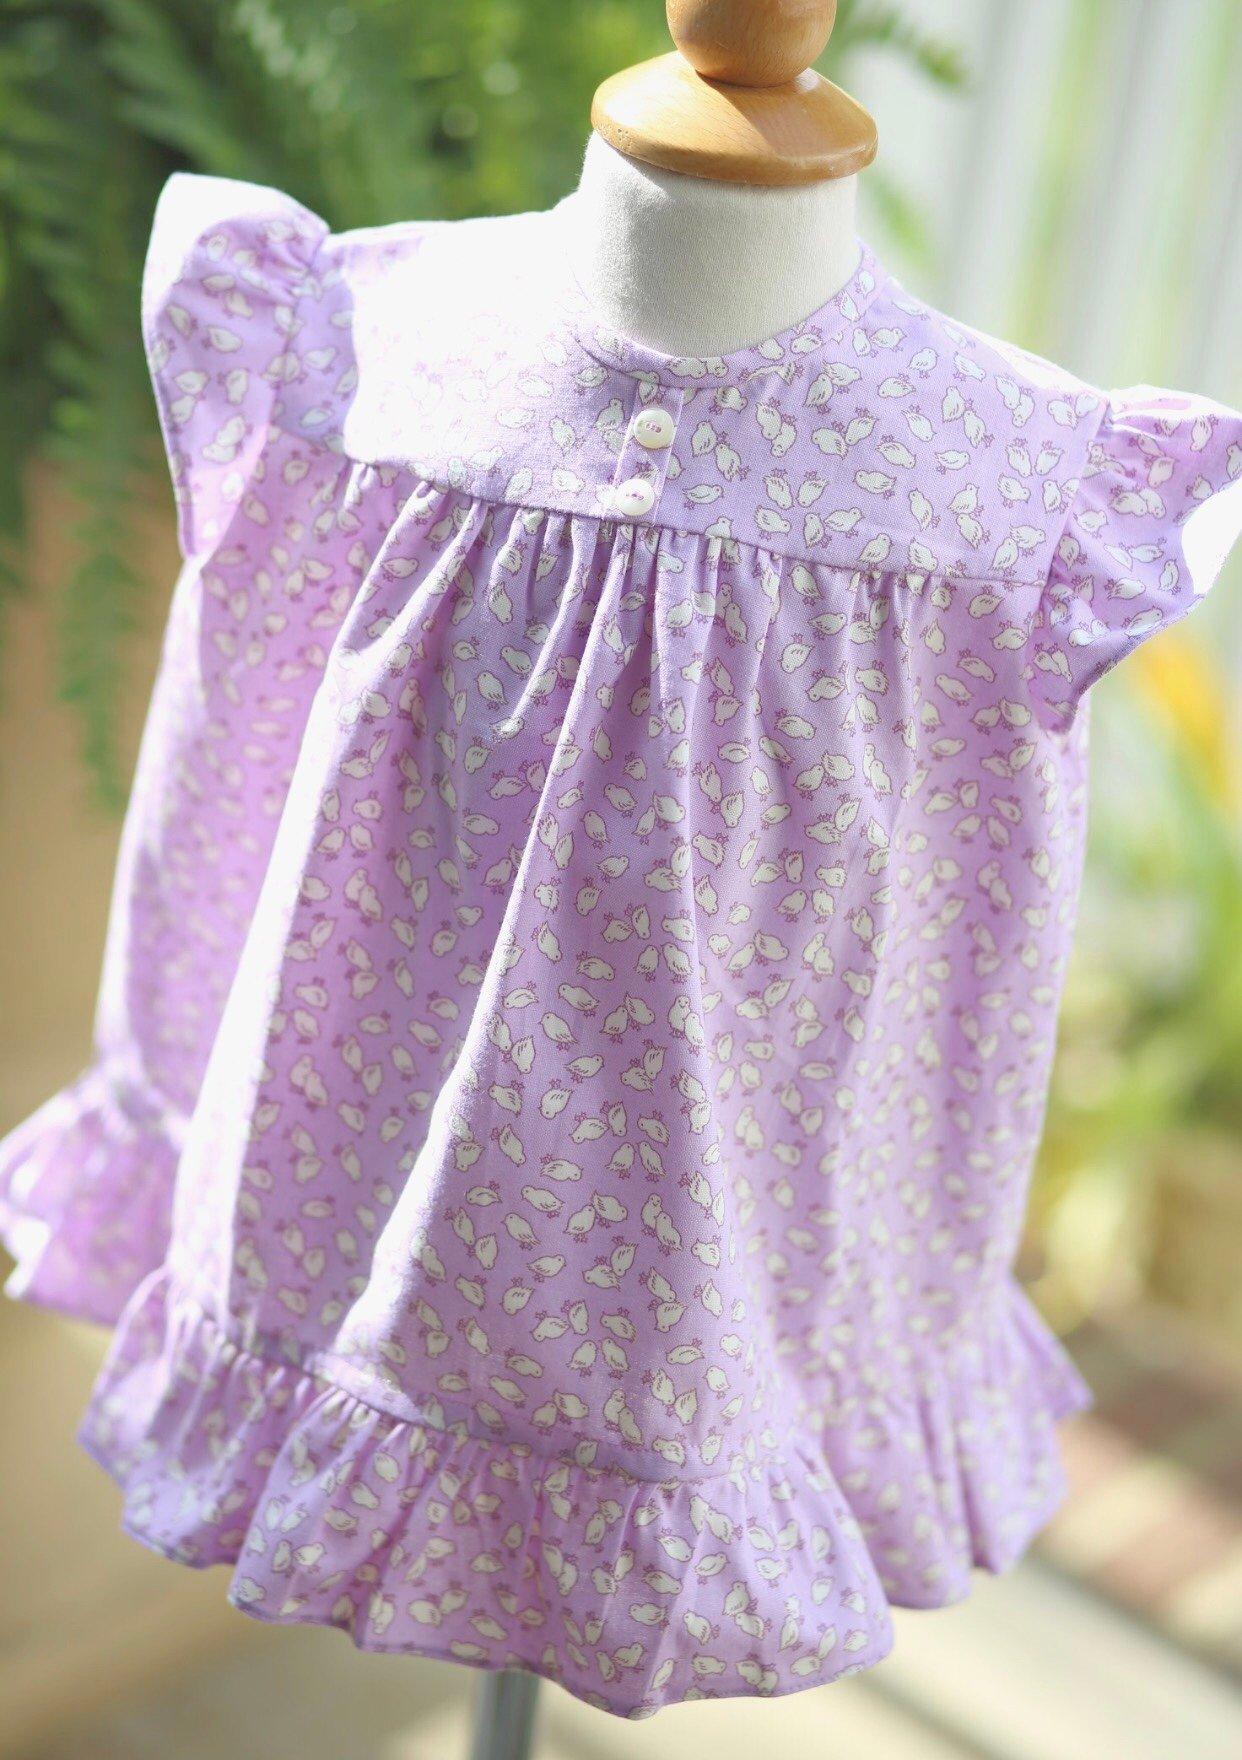 Image of 2T Nana Mae Chick Print Dress